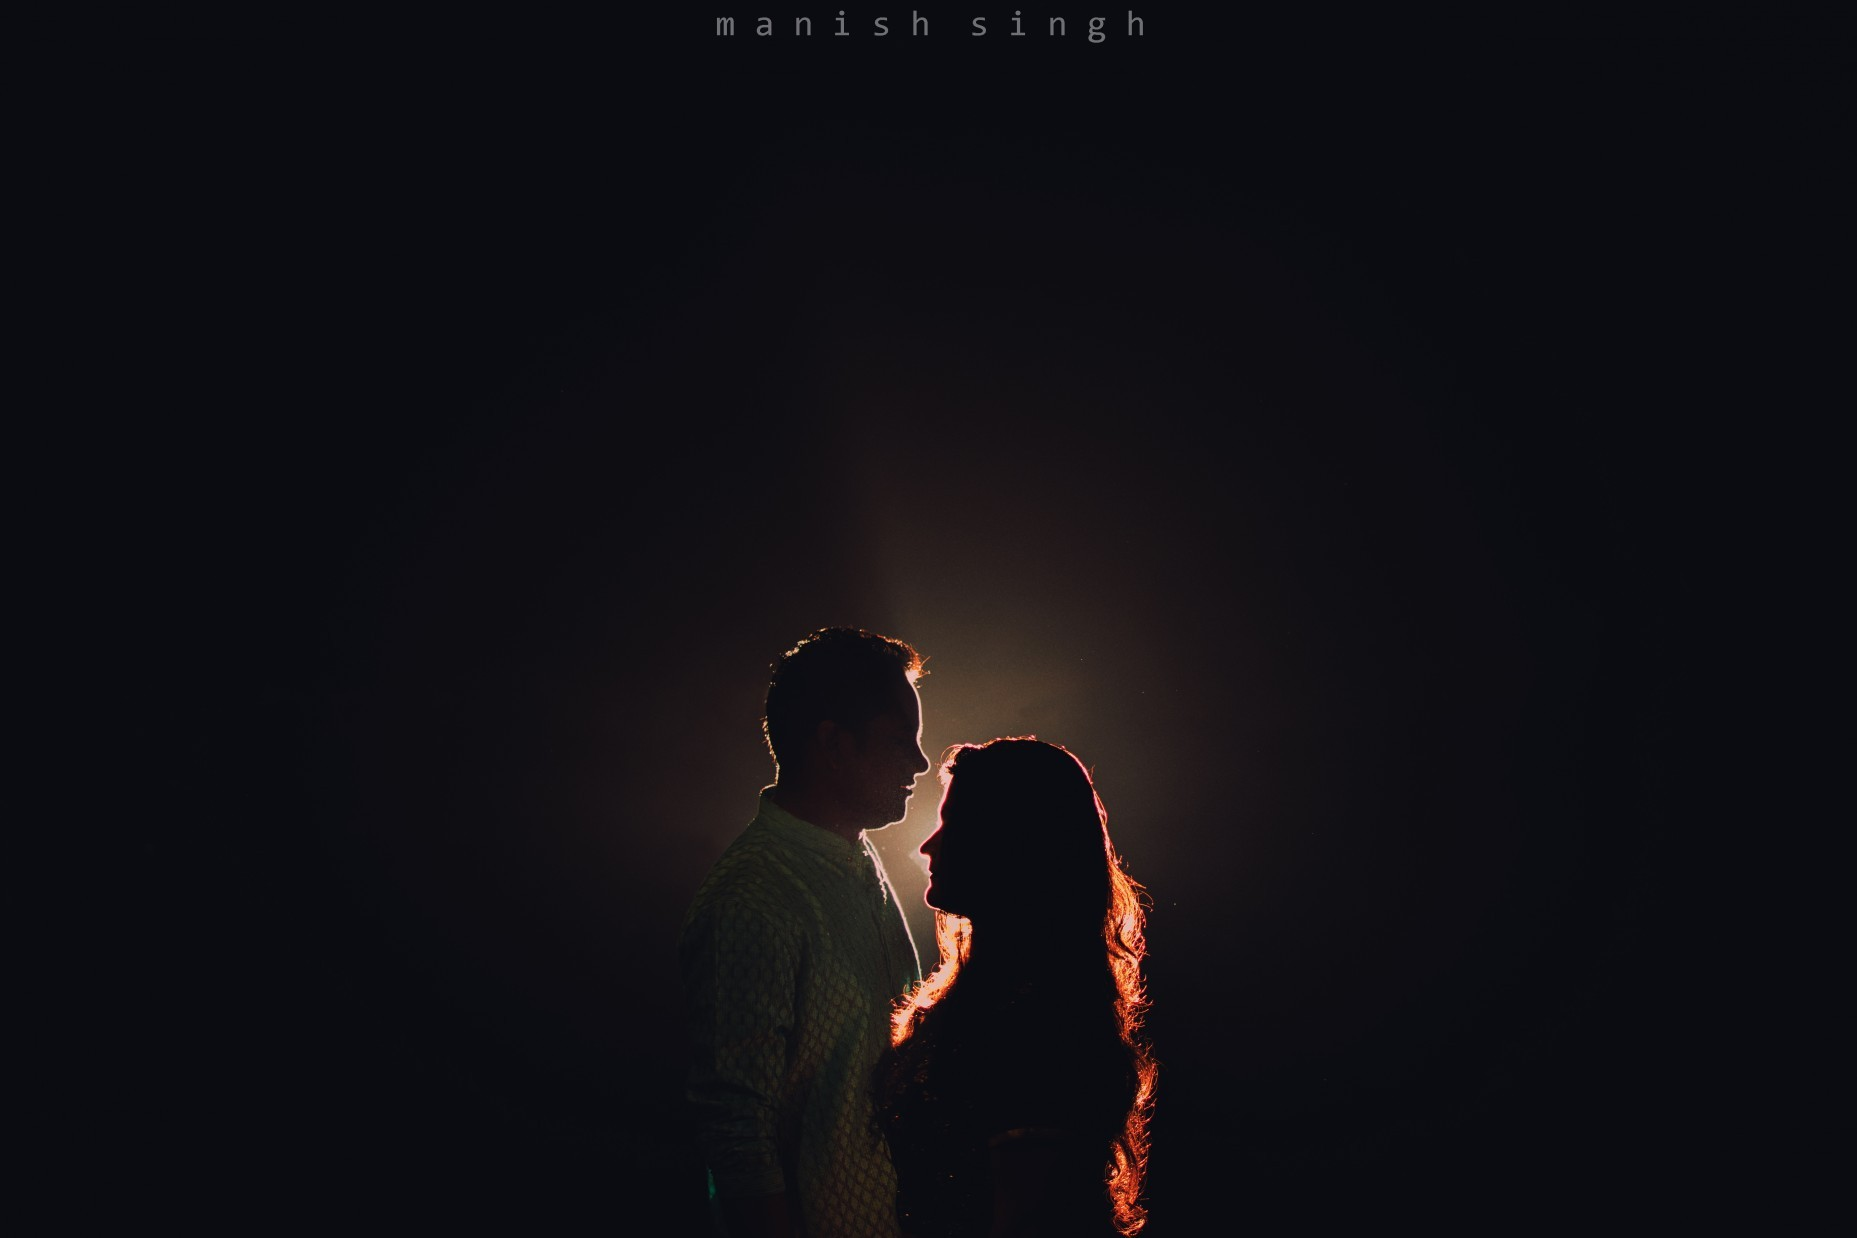 Manish Singh Photography night